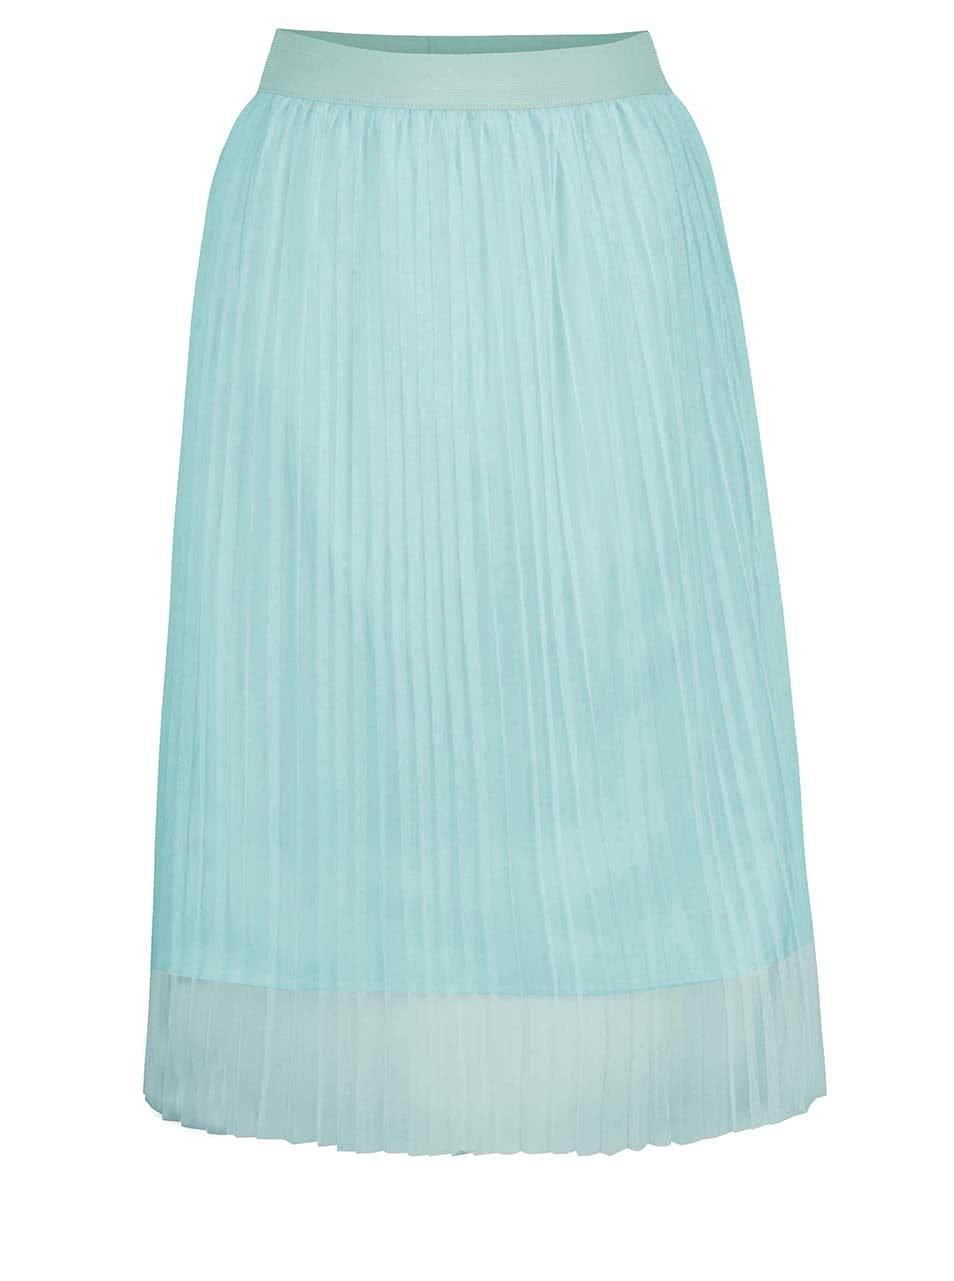 415bacb85bac Svetlomodrá tylová plisovaná midi sukňa TALLY WEiJL ...